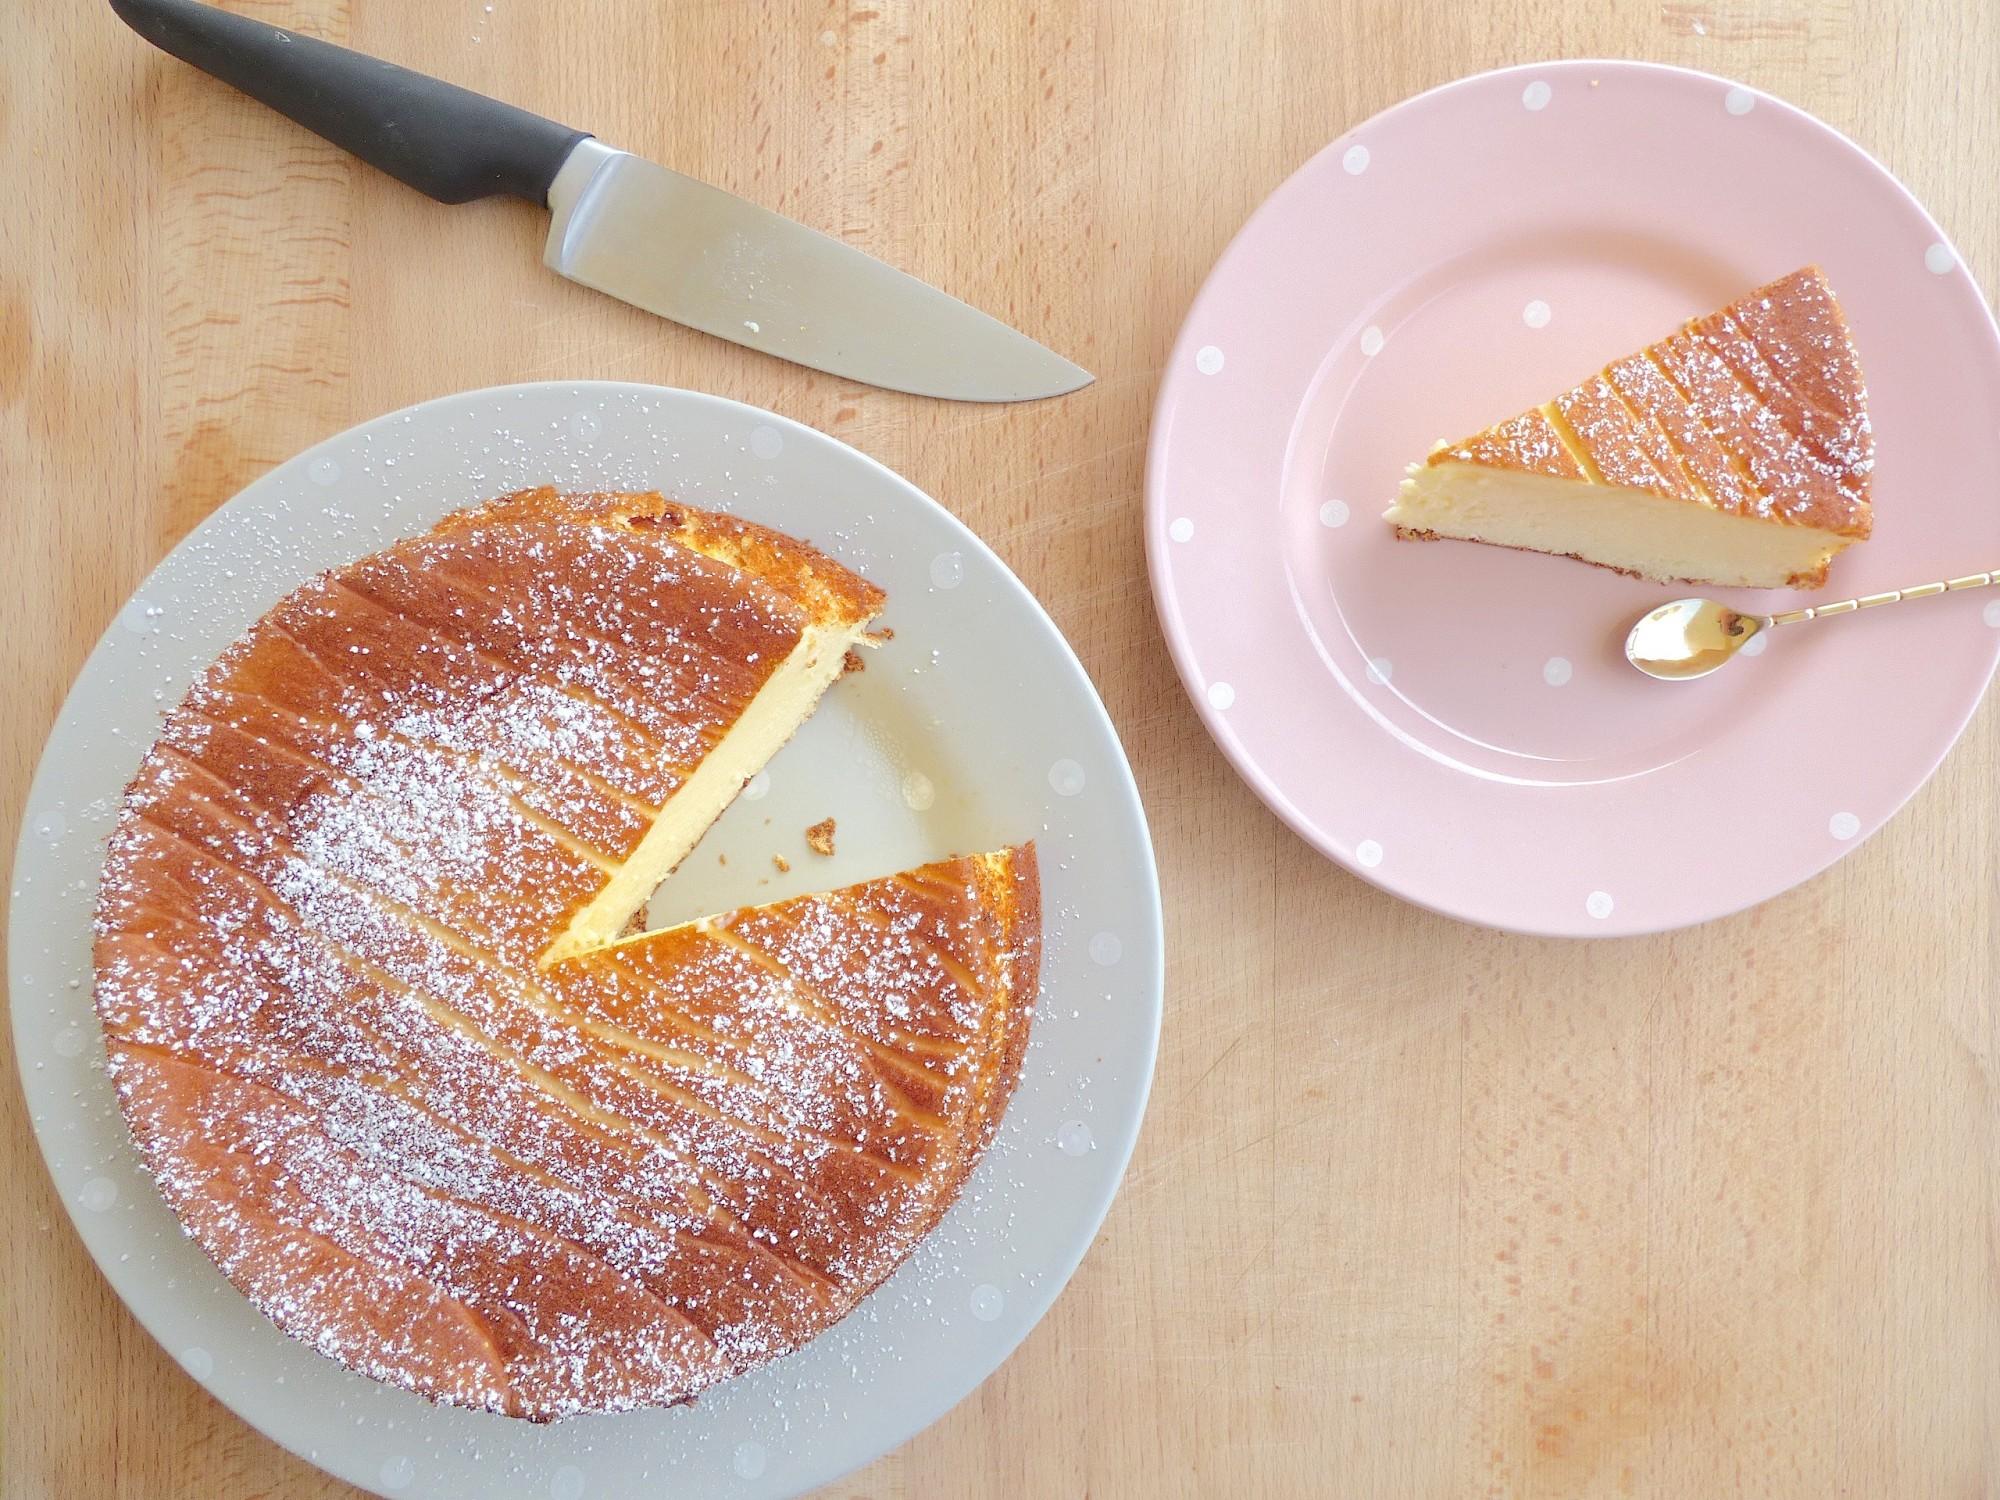 gateau au fromage blanc3